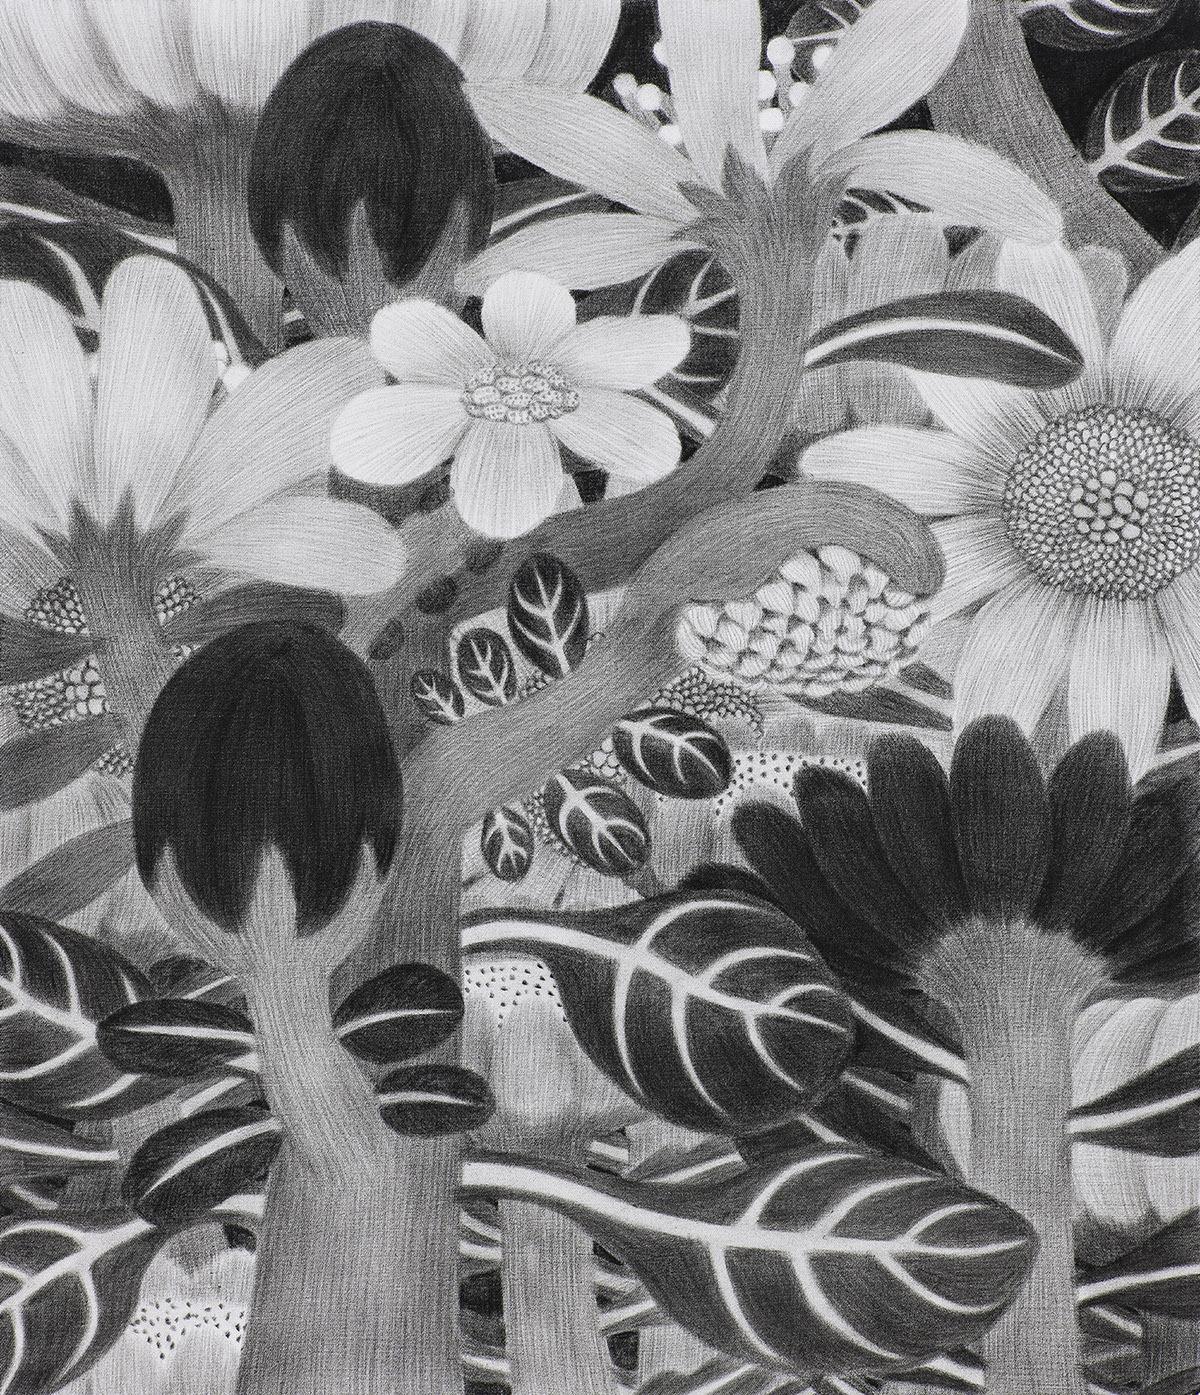 [20p2617] 2020_식물숲 #2_conte on daimaru_53.0×45.5.jpg